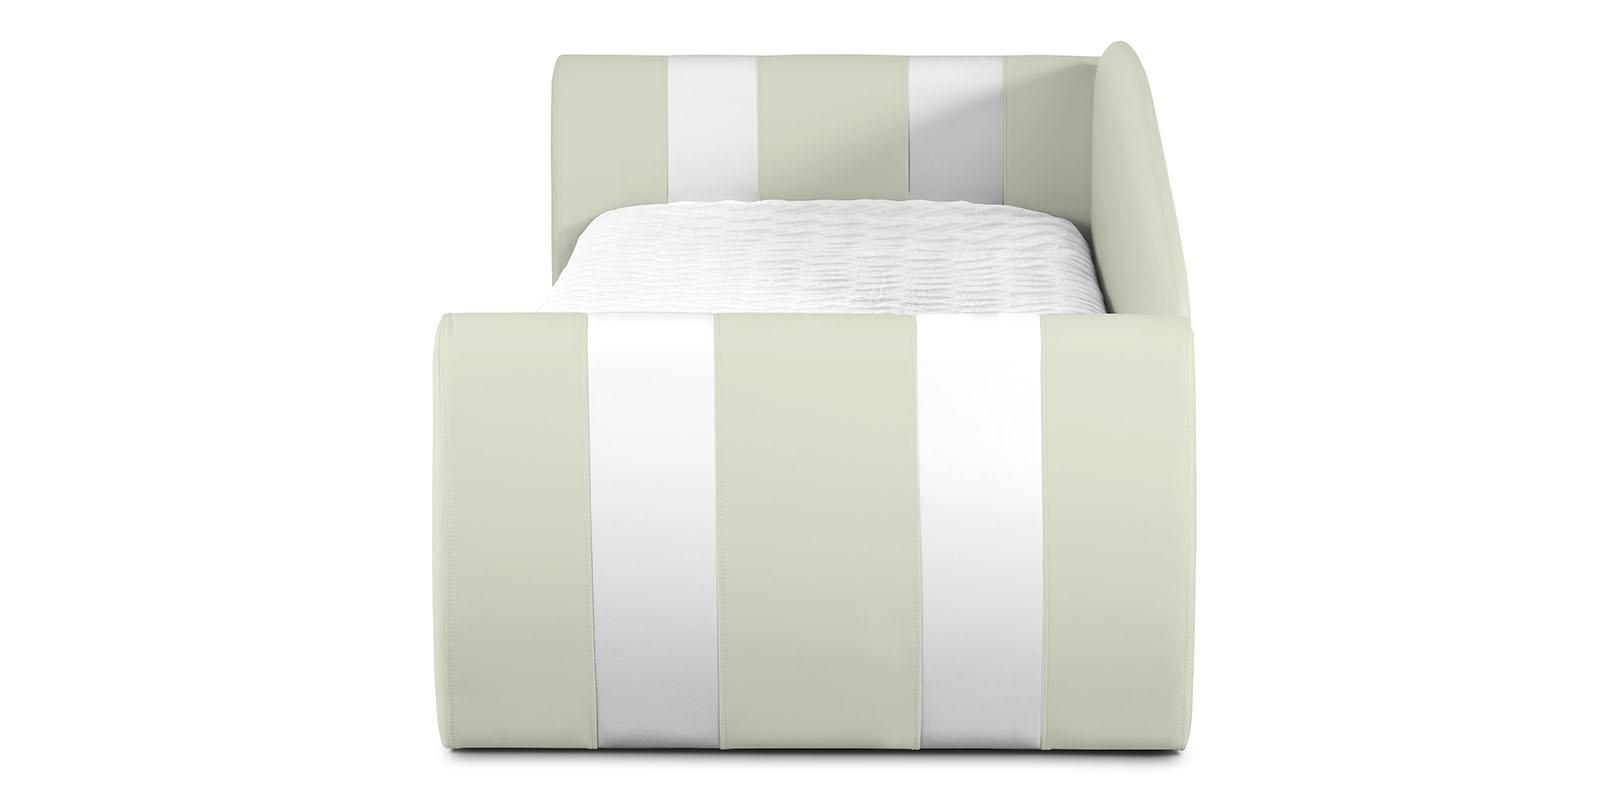 Мягкая кровать 190х90 Монако угол правый (молочный/белый) от HomeMe.ru